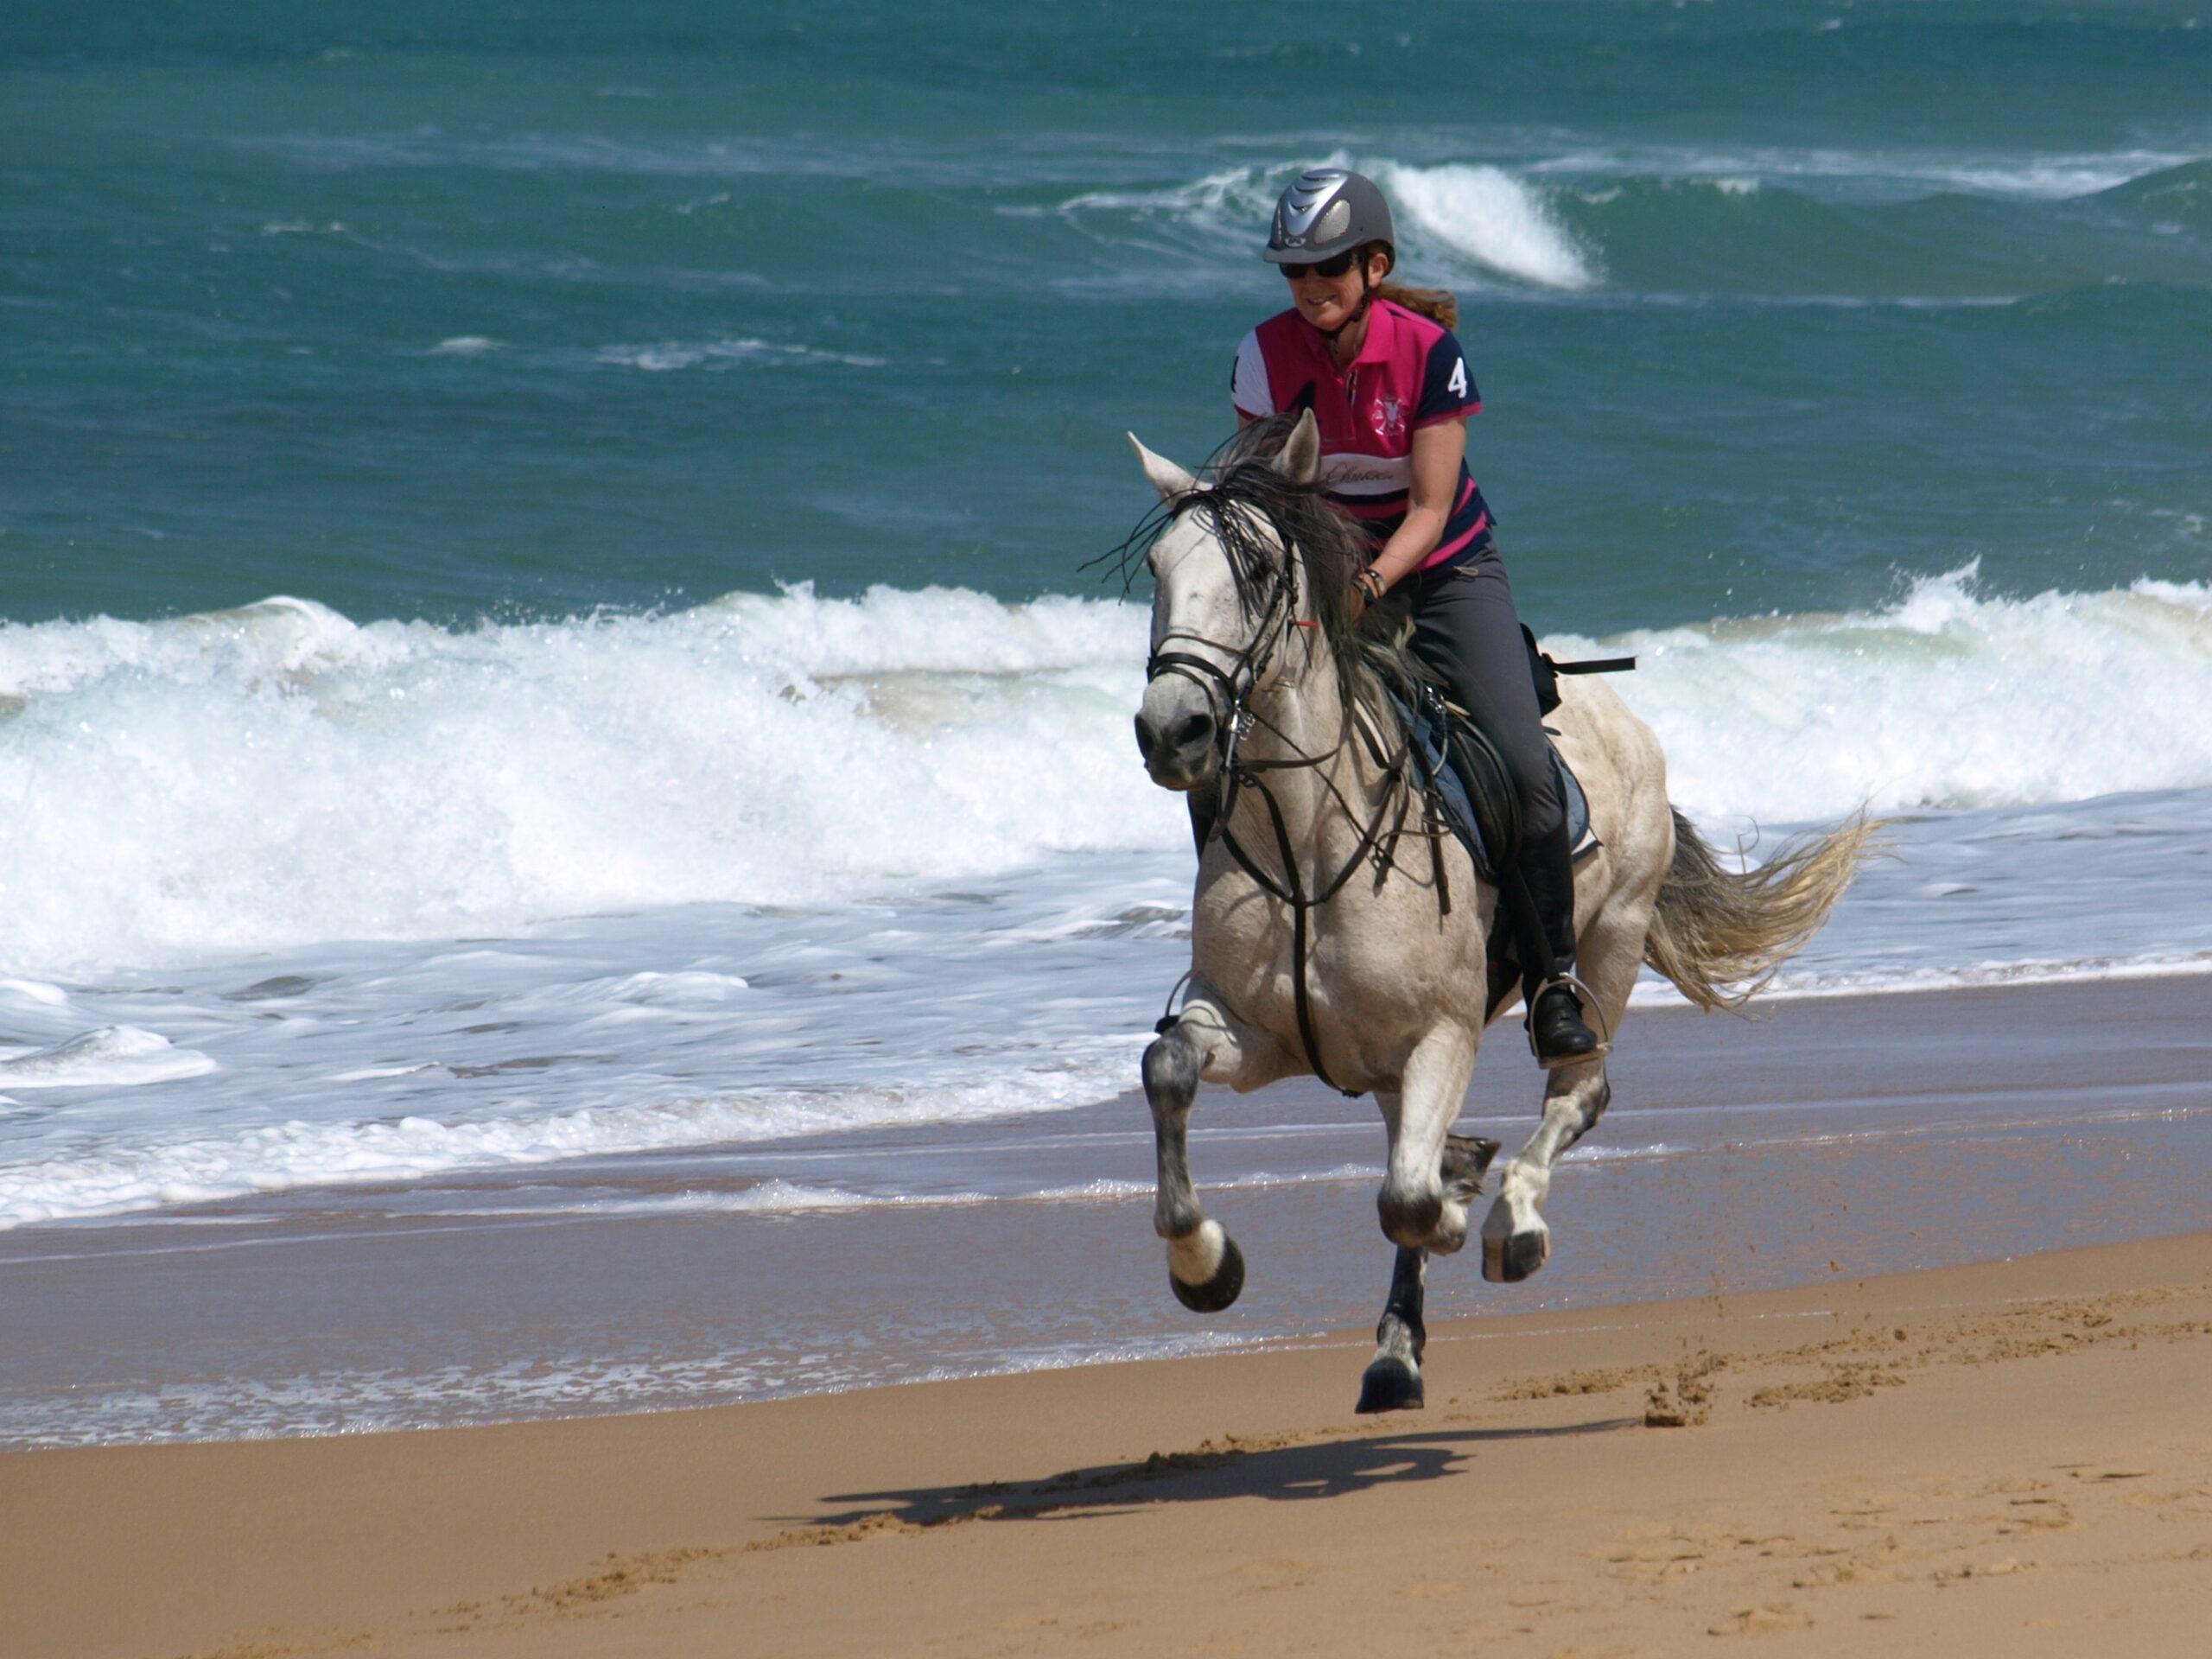 In volle galop op het strand in Zuid Spanje - Vakantie te paard / Reisbureau Perlan